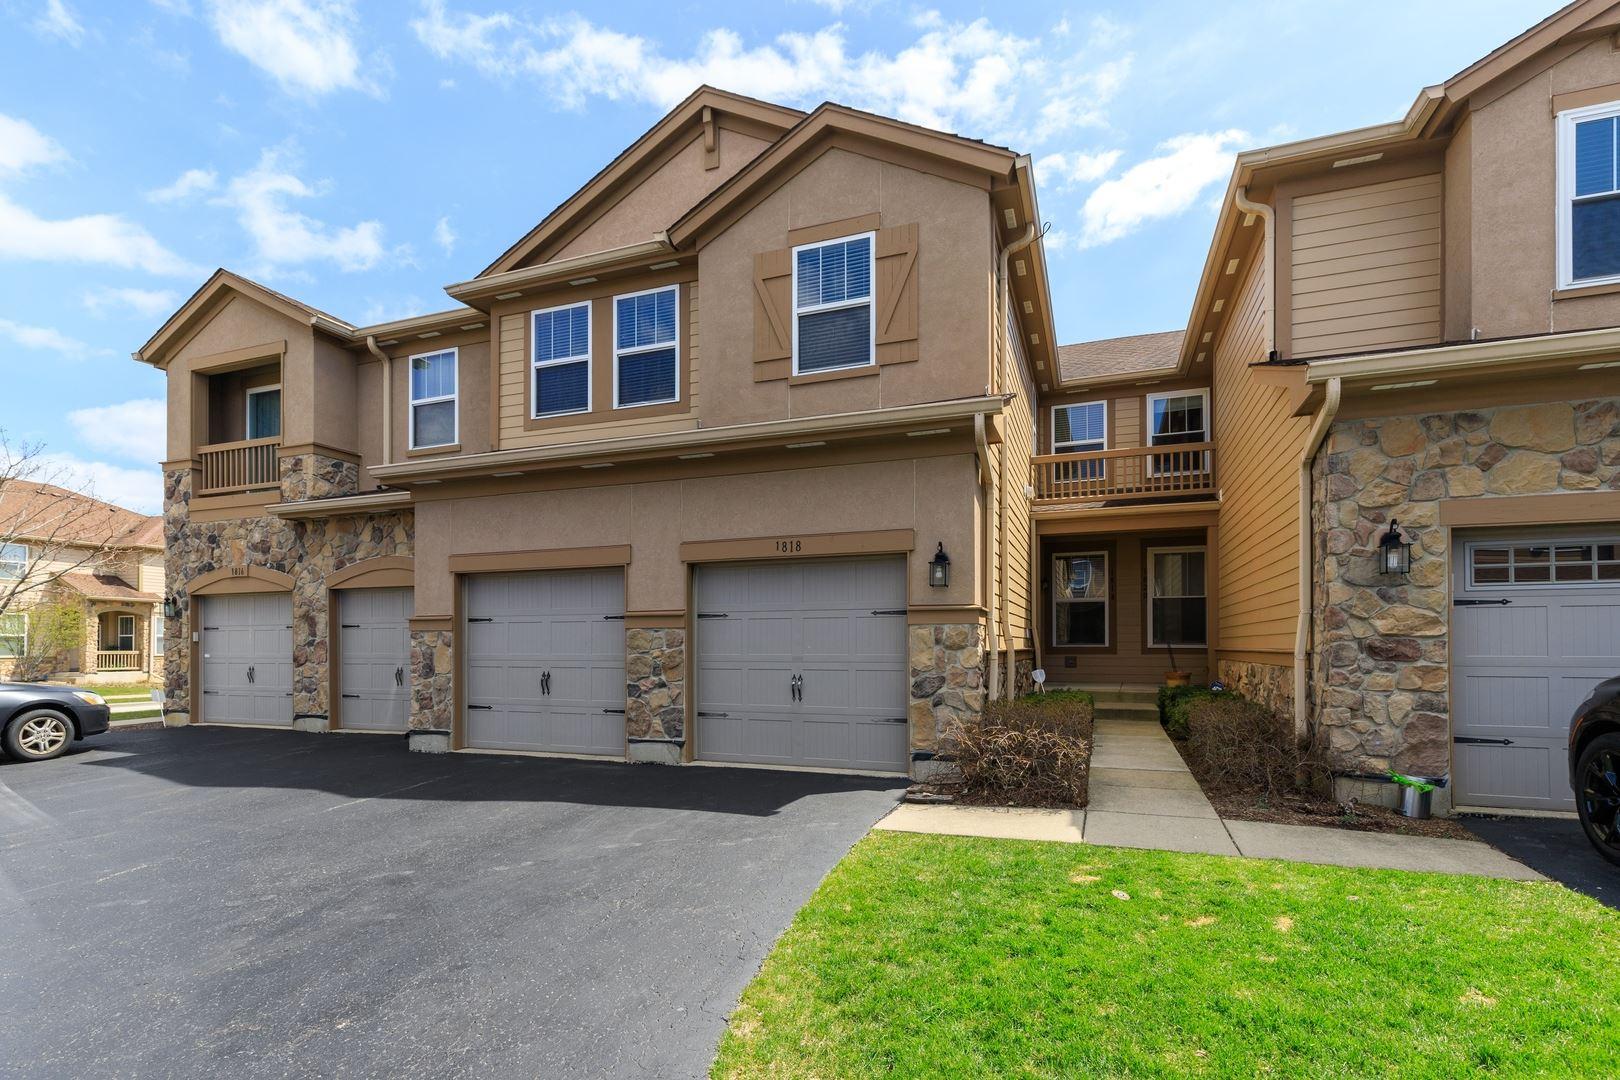 1818 Crenshaw Circle, Vernon Hills, IL 60061 - #: 10634215